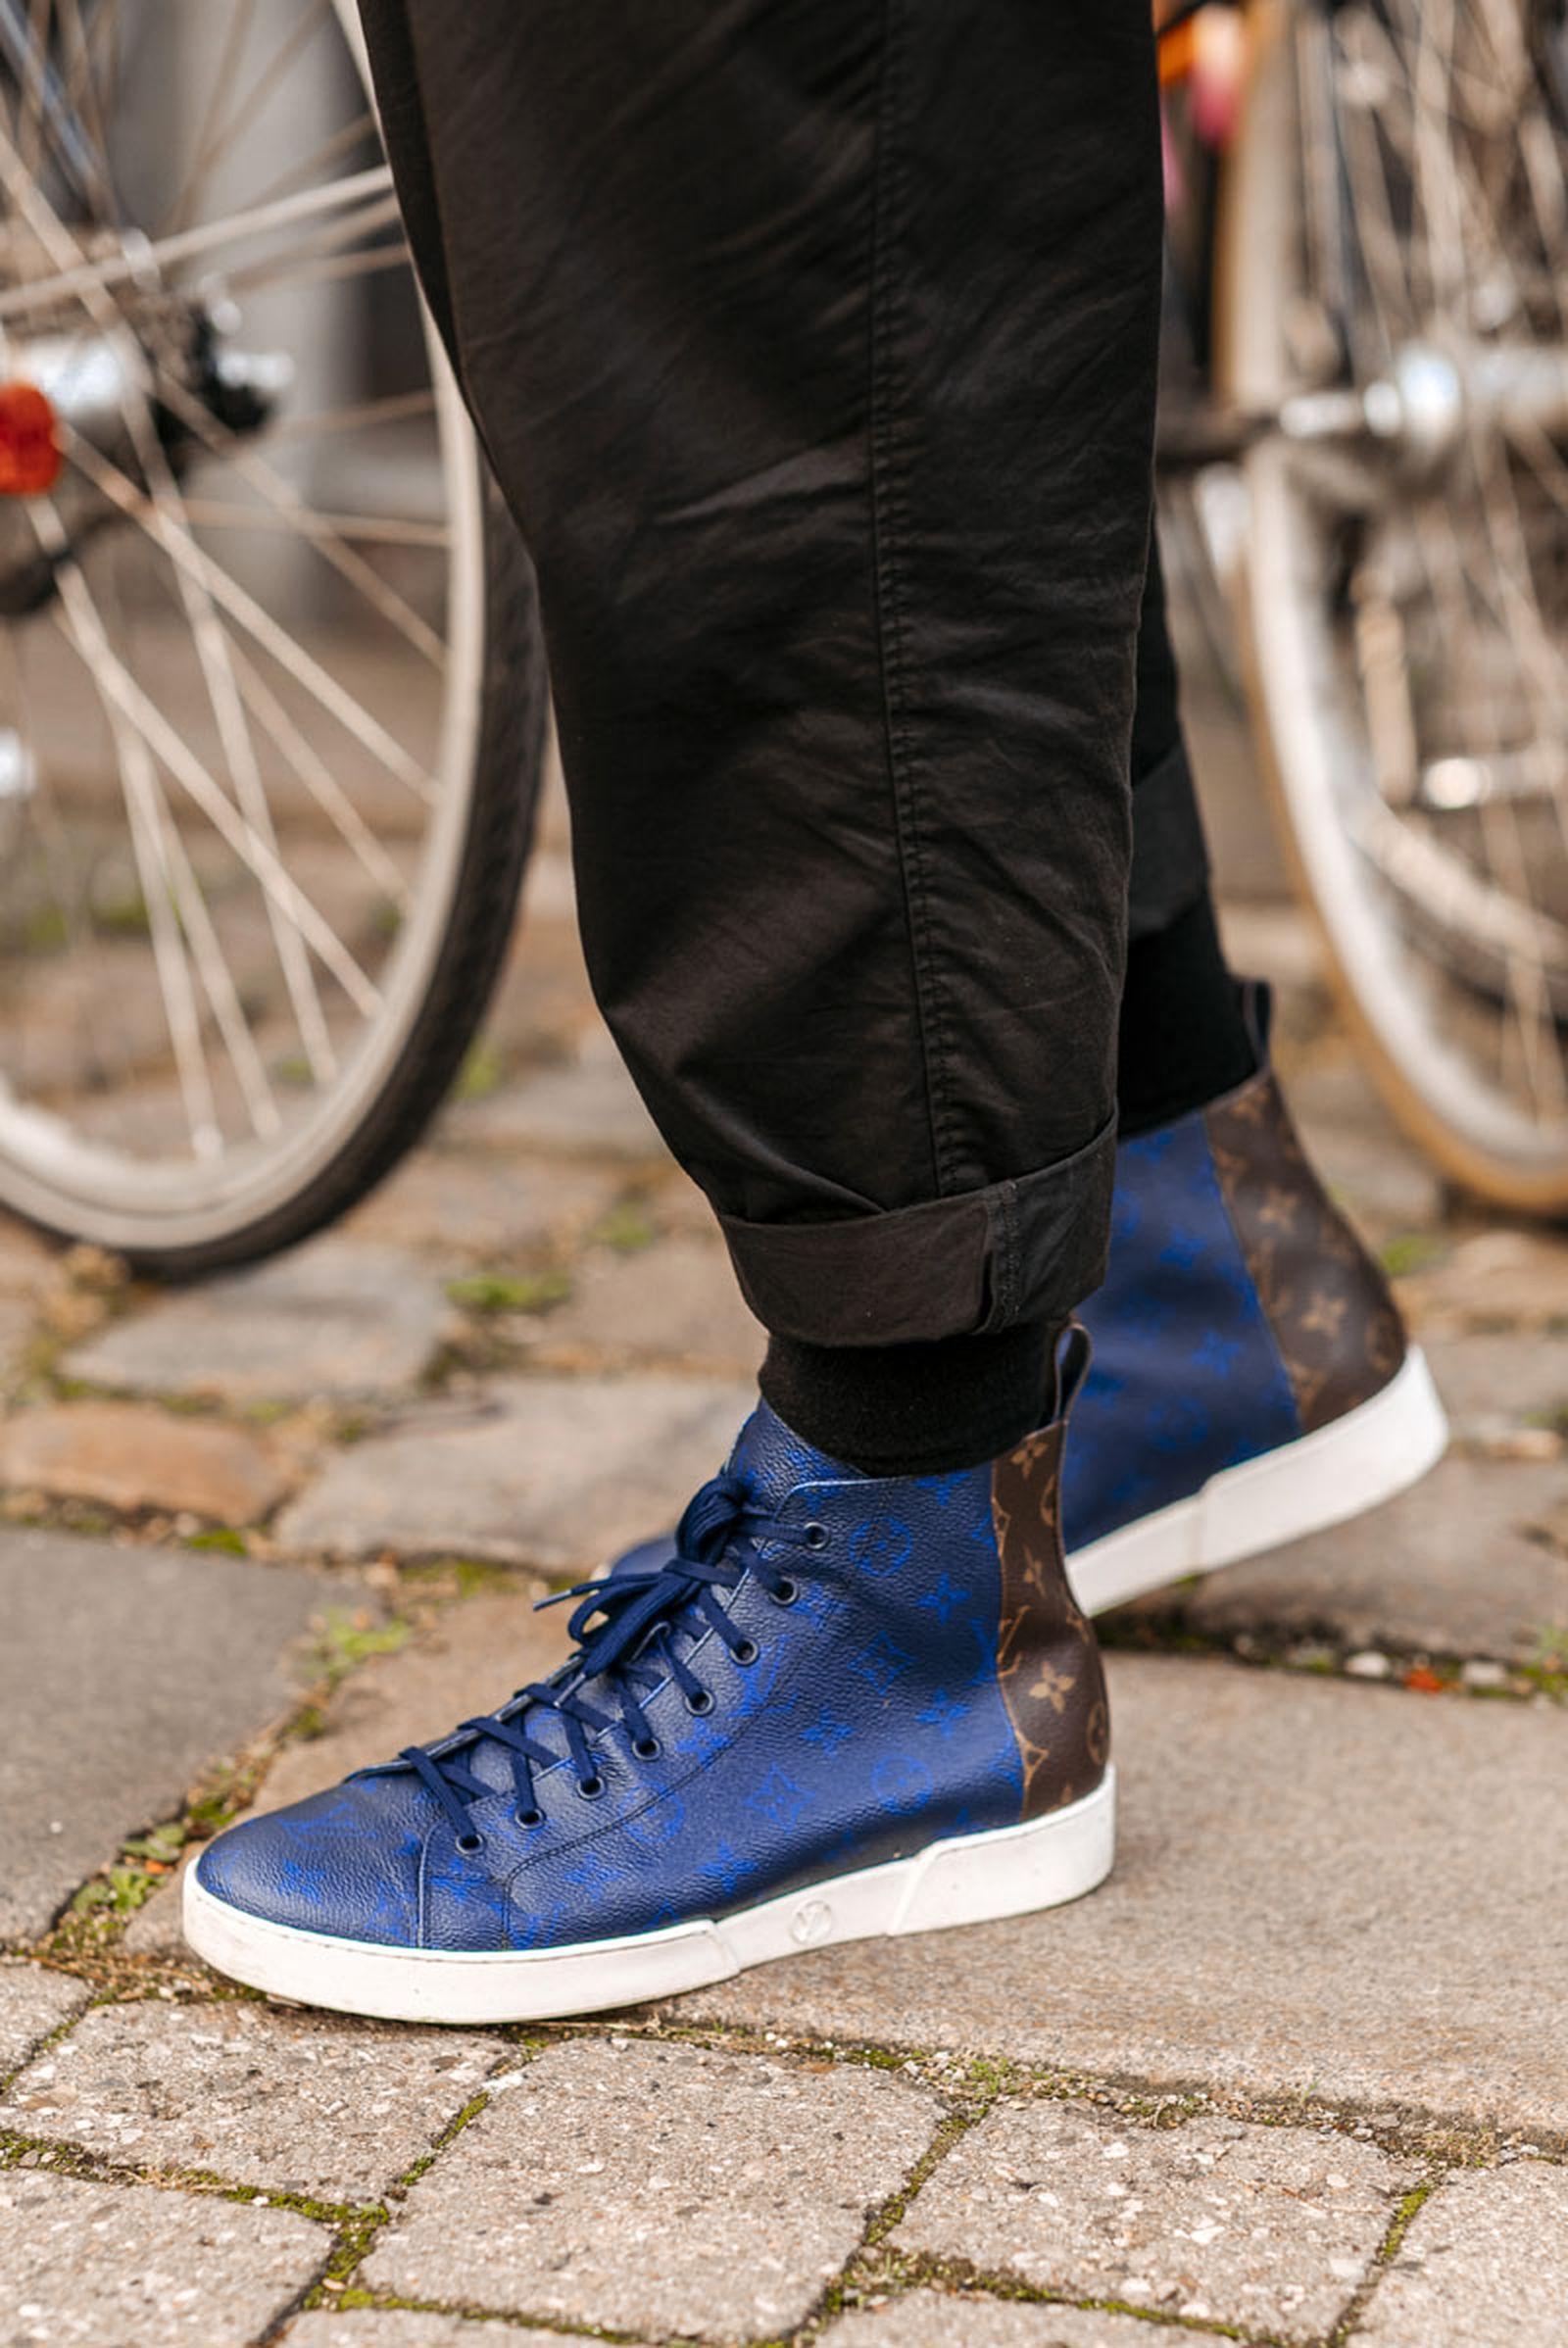 MSS20 Copenhagen StreetStyle Sneakers 15 Copenhagen Fashion Week SS20 New Balance adida